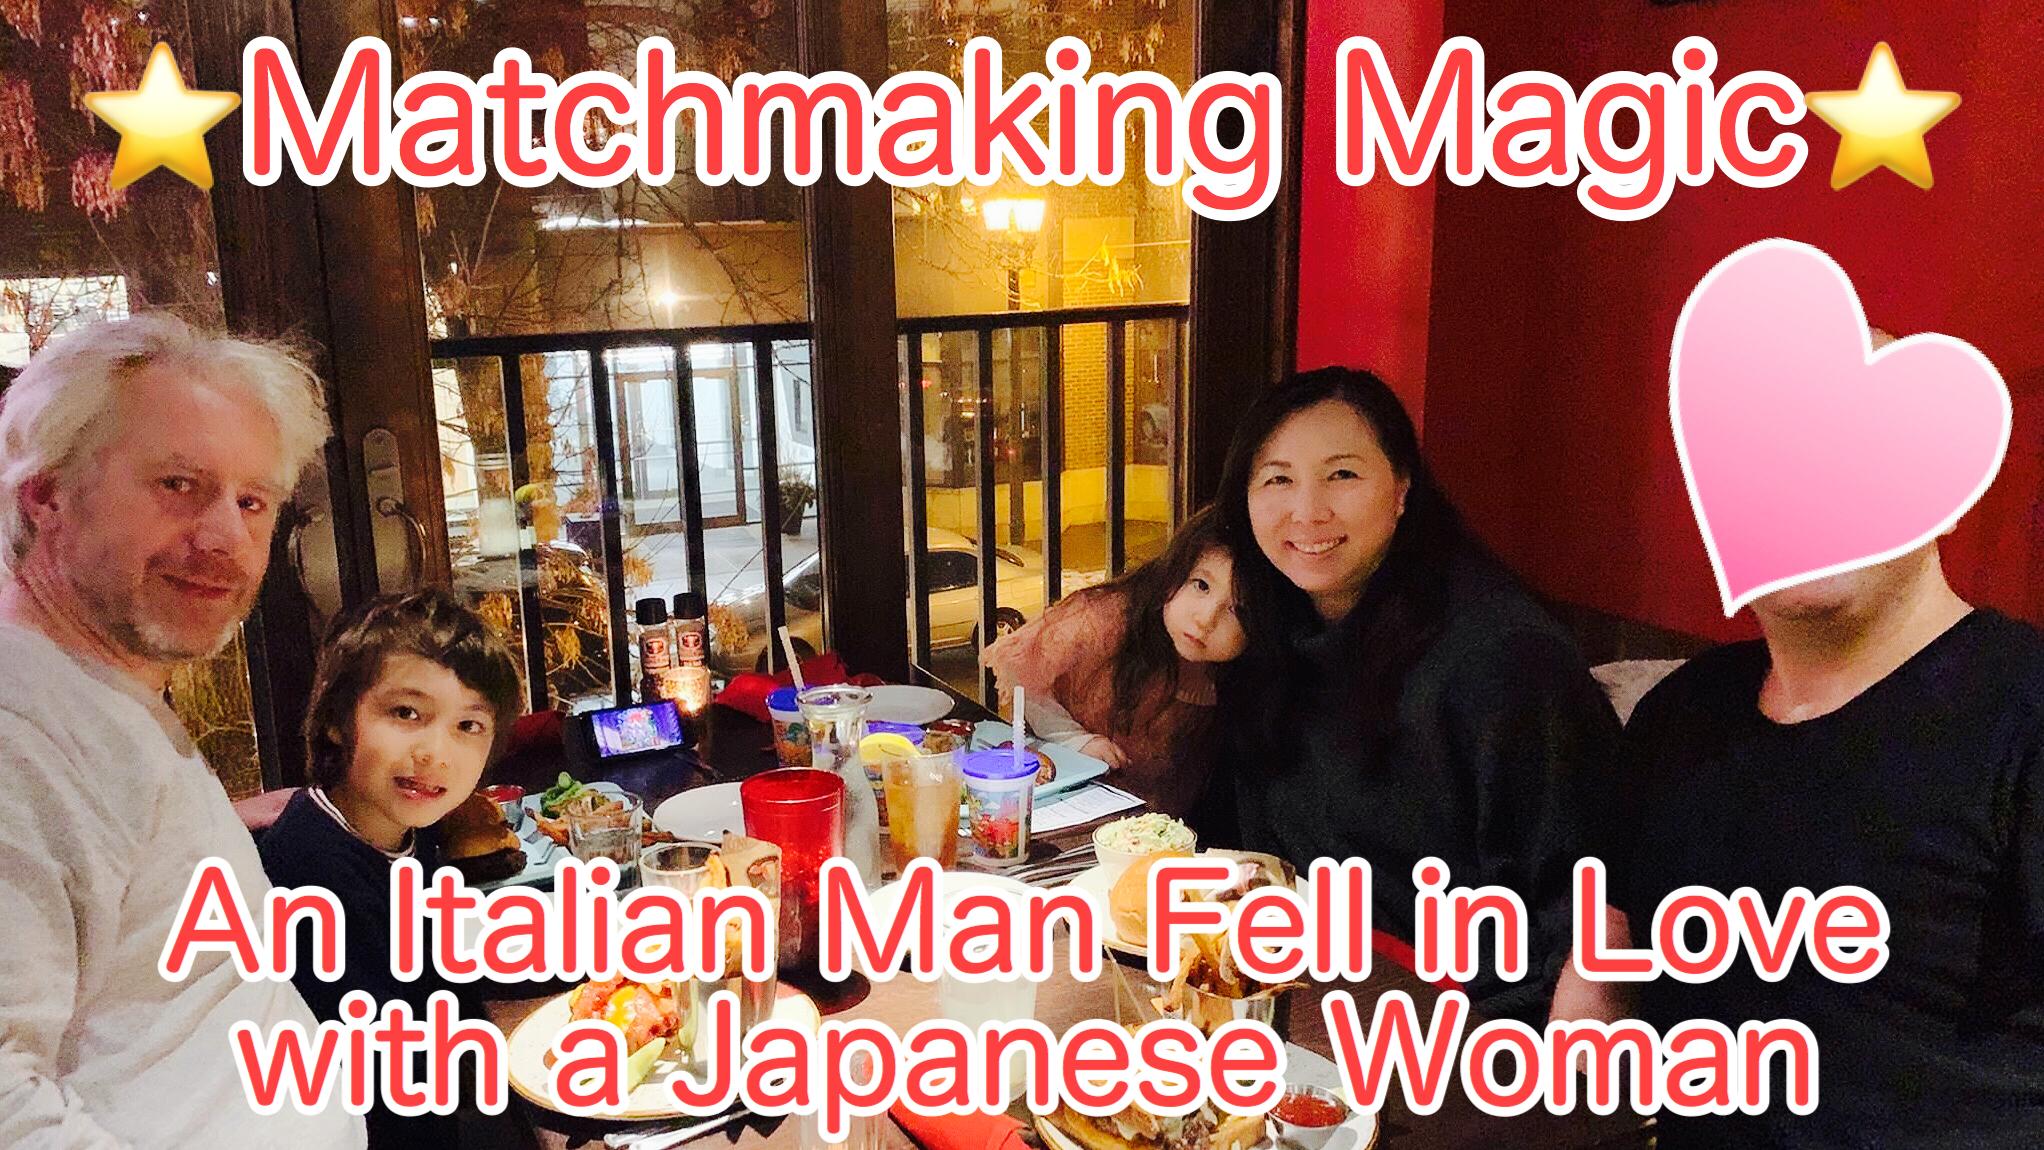 An Italian Man Fell in Love with a Japanese Woman